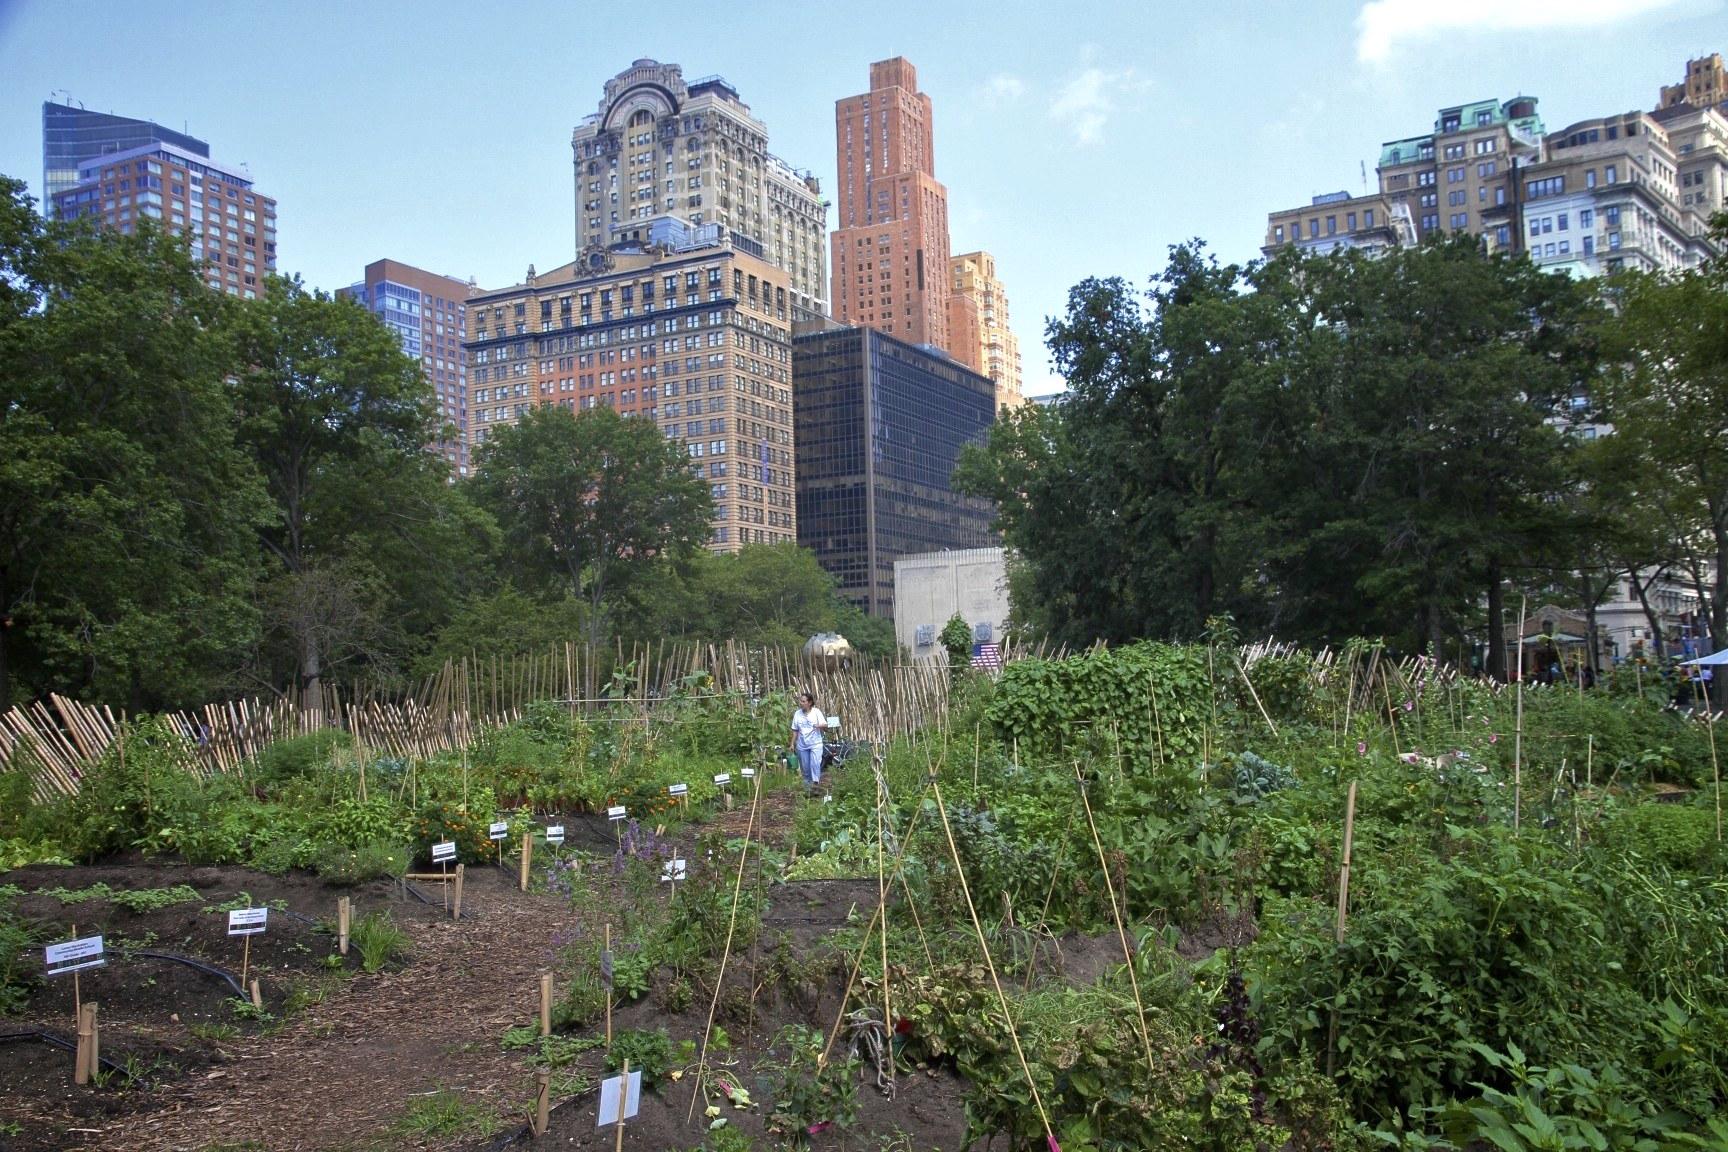 Figure 7: Urban farming in Detroit. (Photo via 8thnbee.com)